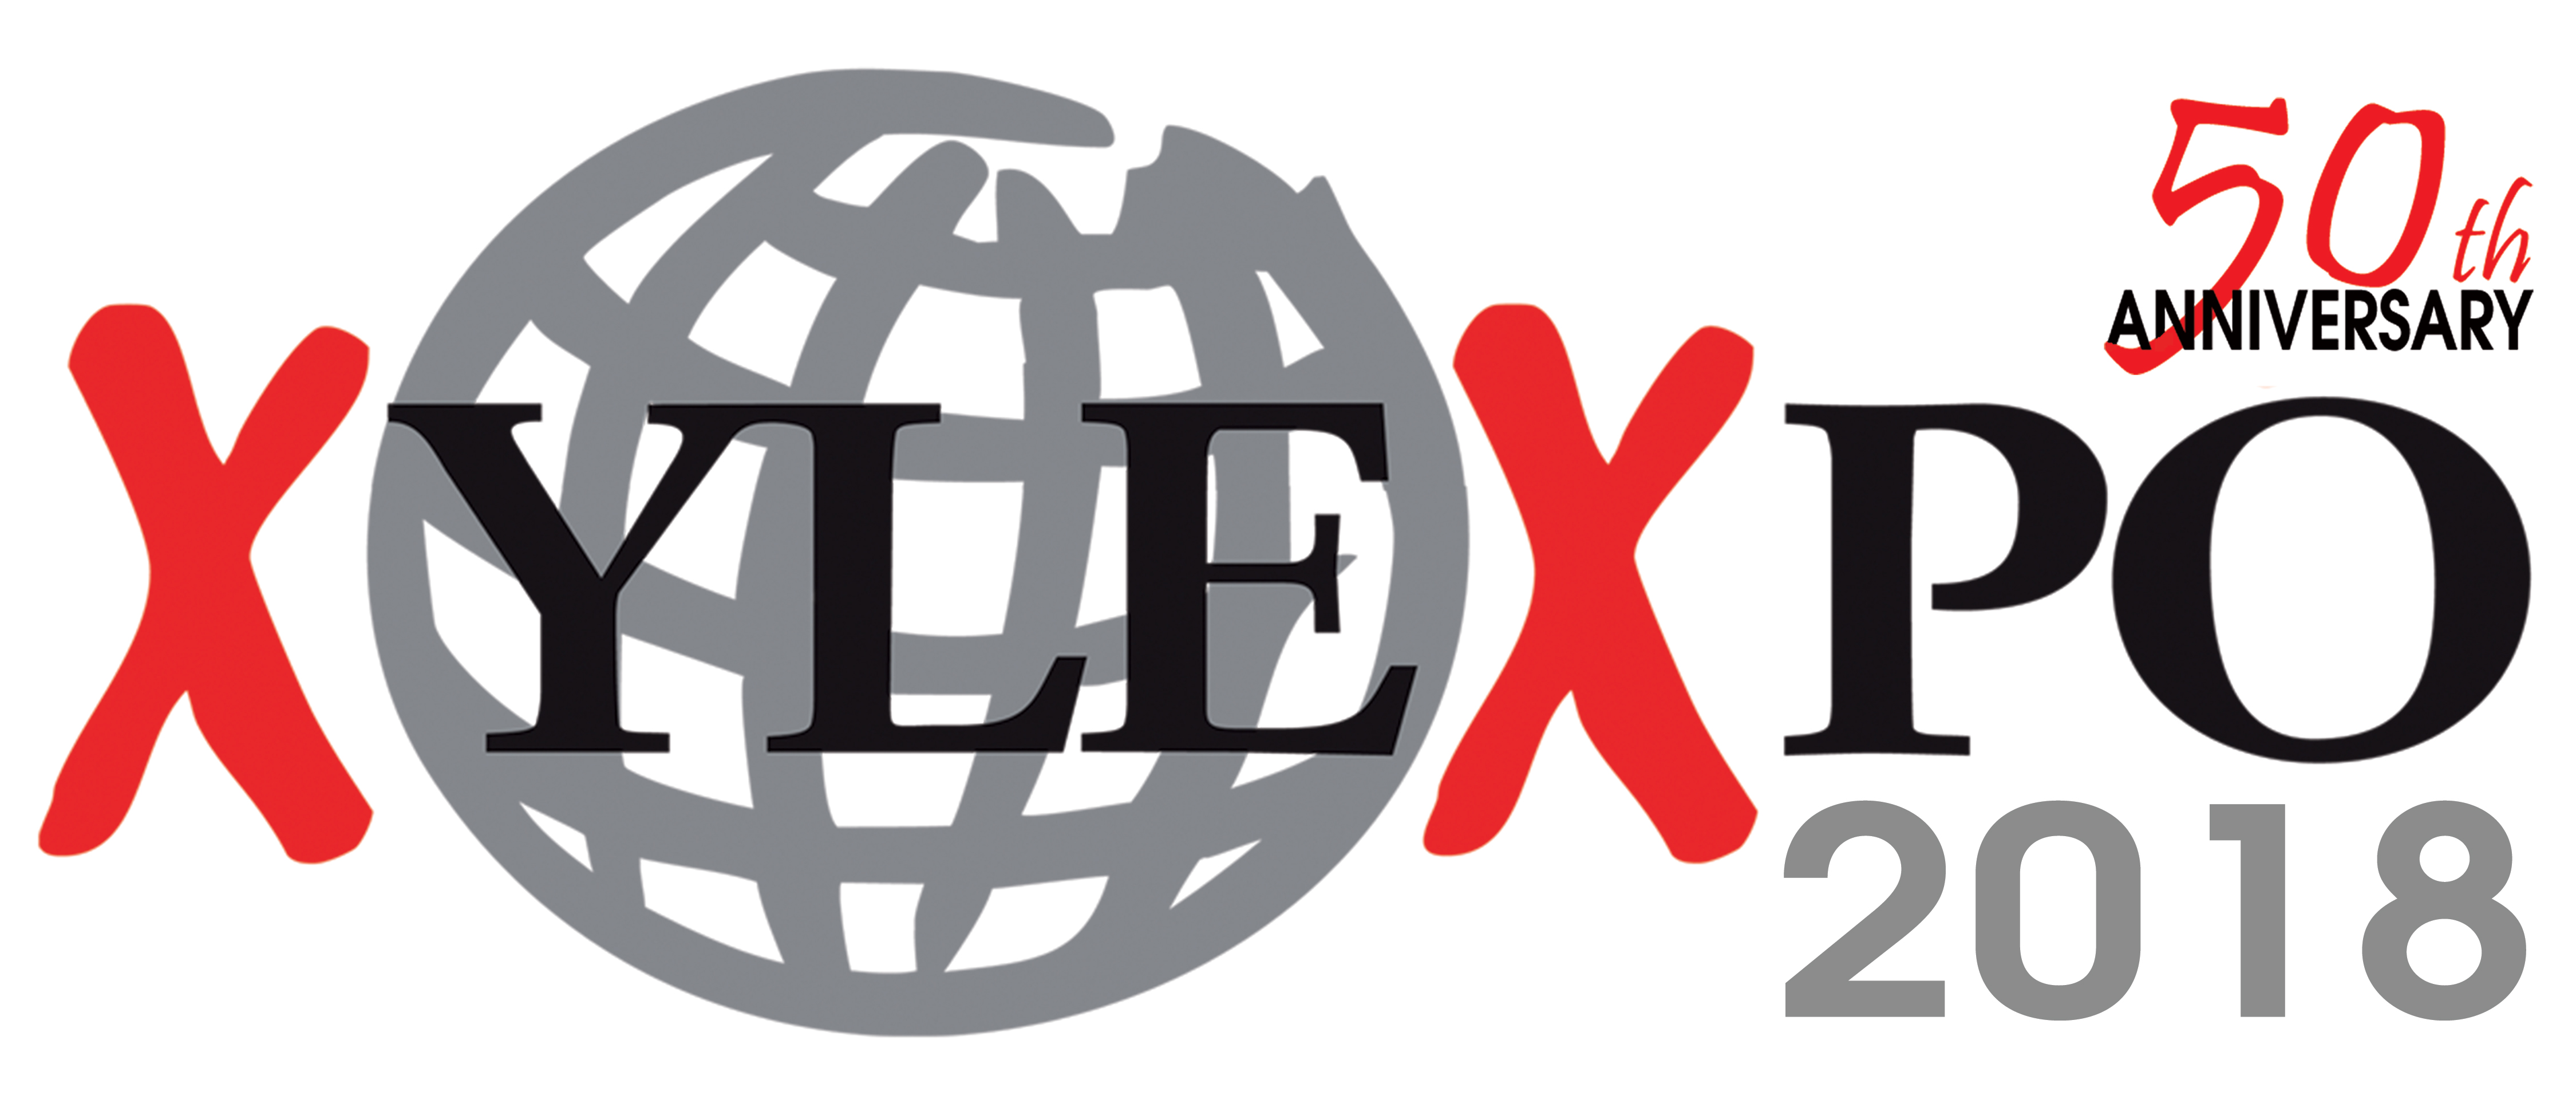 XYLEXPO 2016 - MILÁN (ITALIA) 25 - 28 MAYO 2